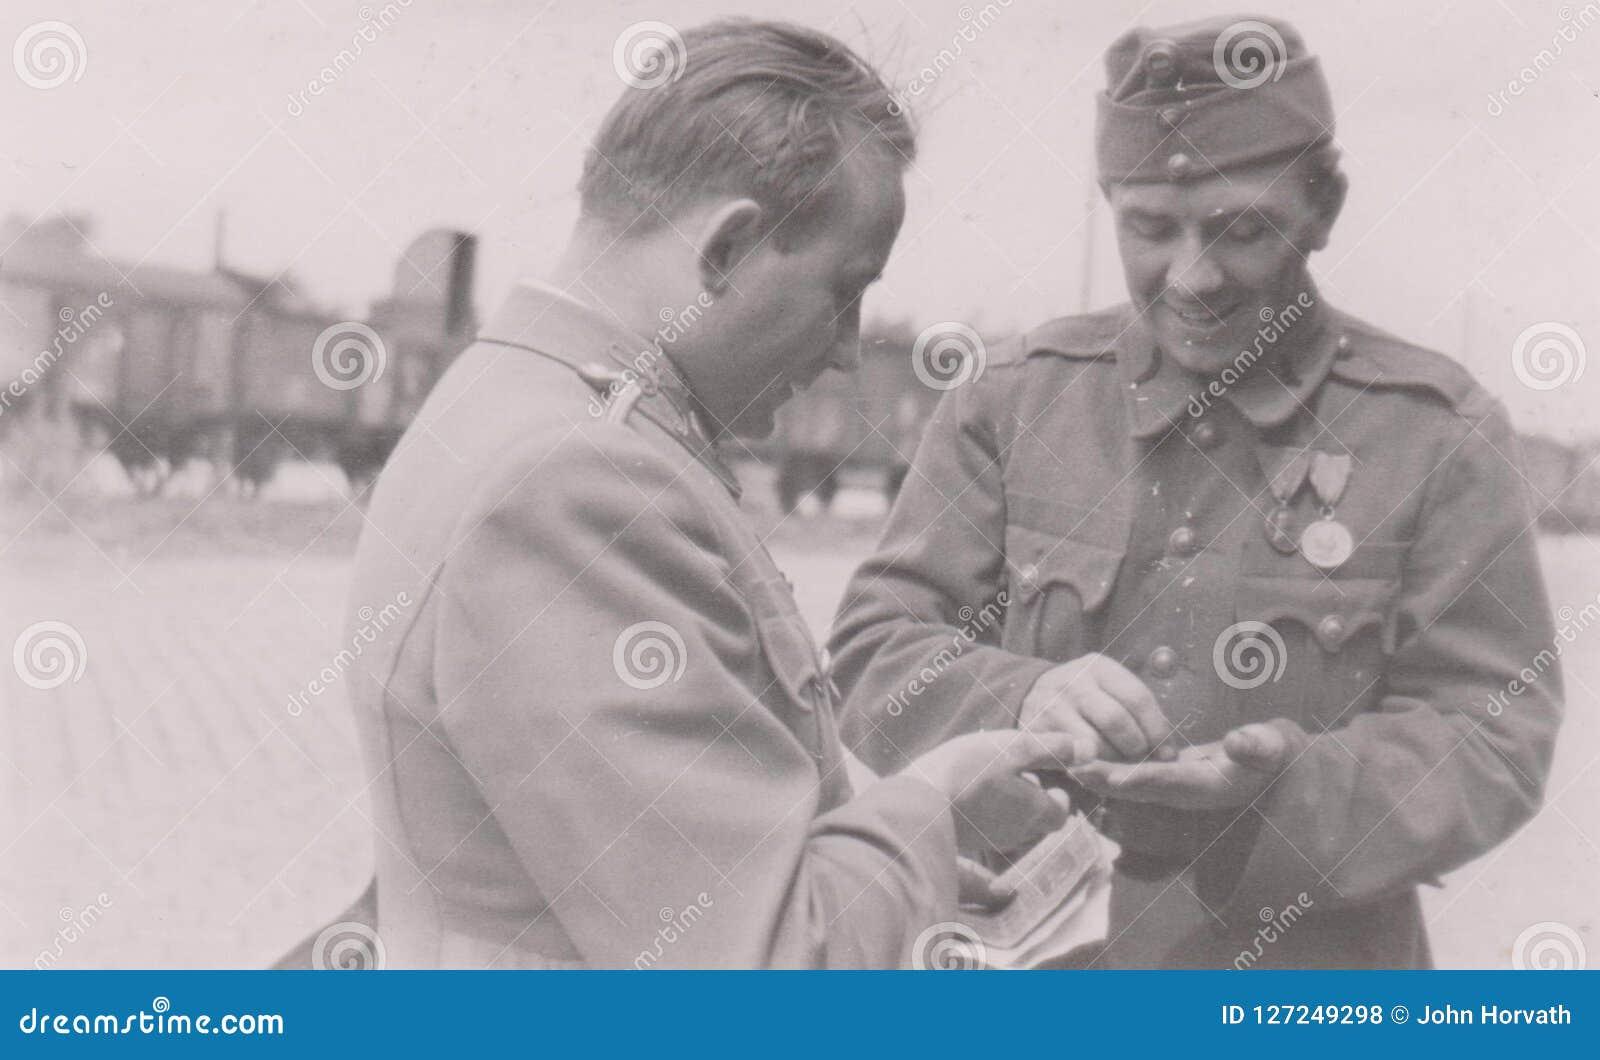 S00003 WWII σιδηροδρομικών σταθμών στρατιωτική φωτογραφία Ουγγαρία